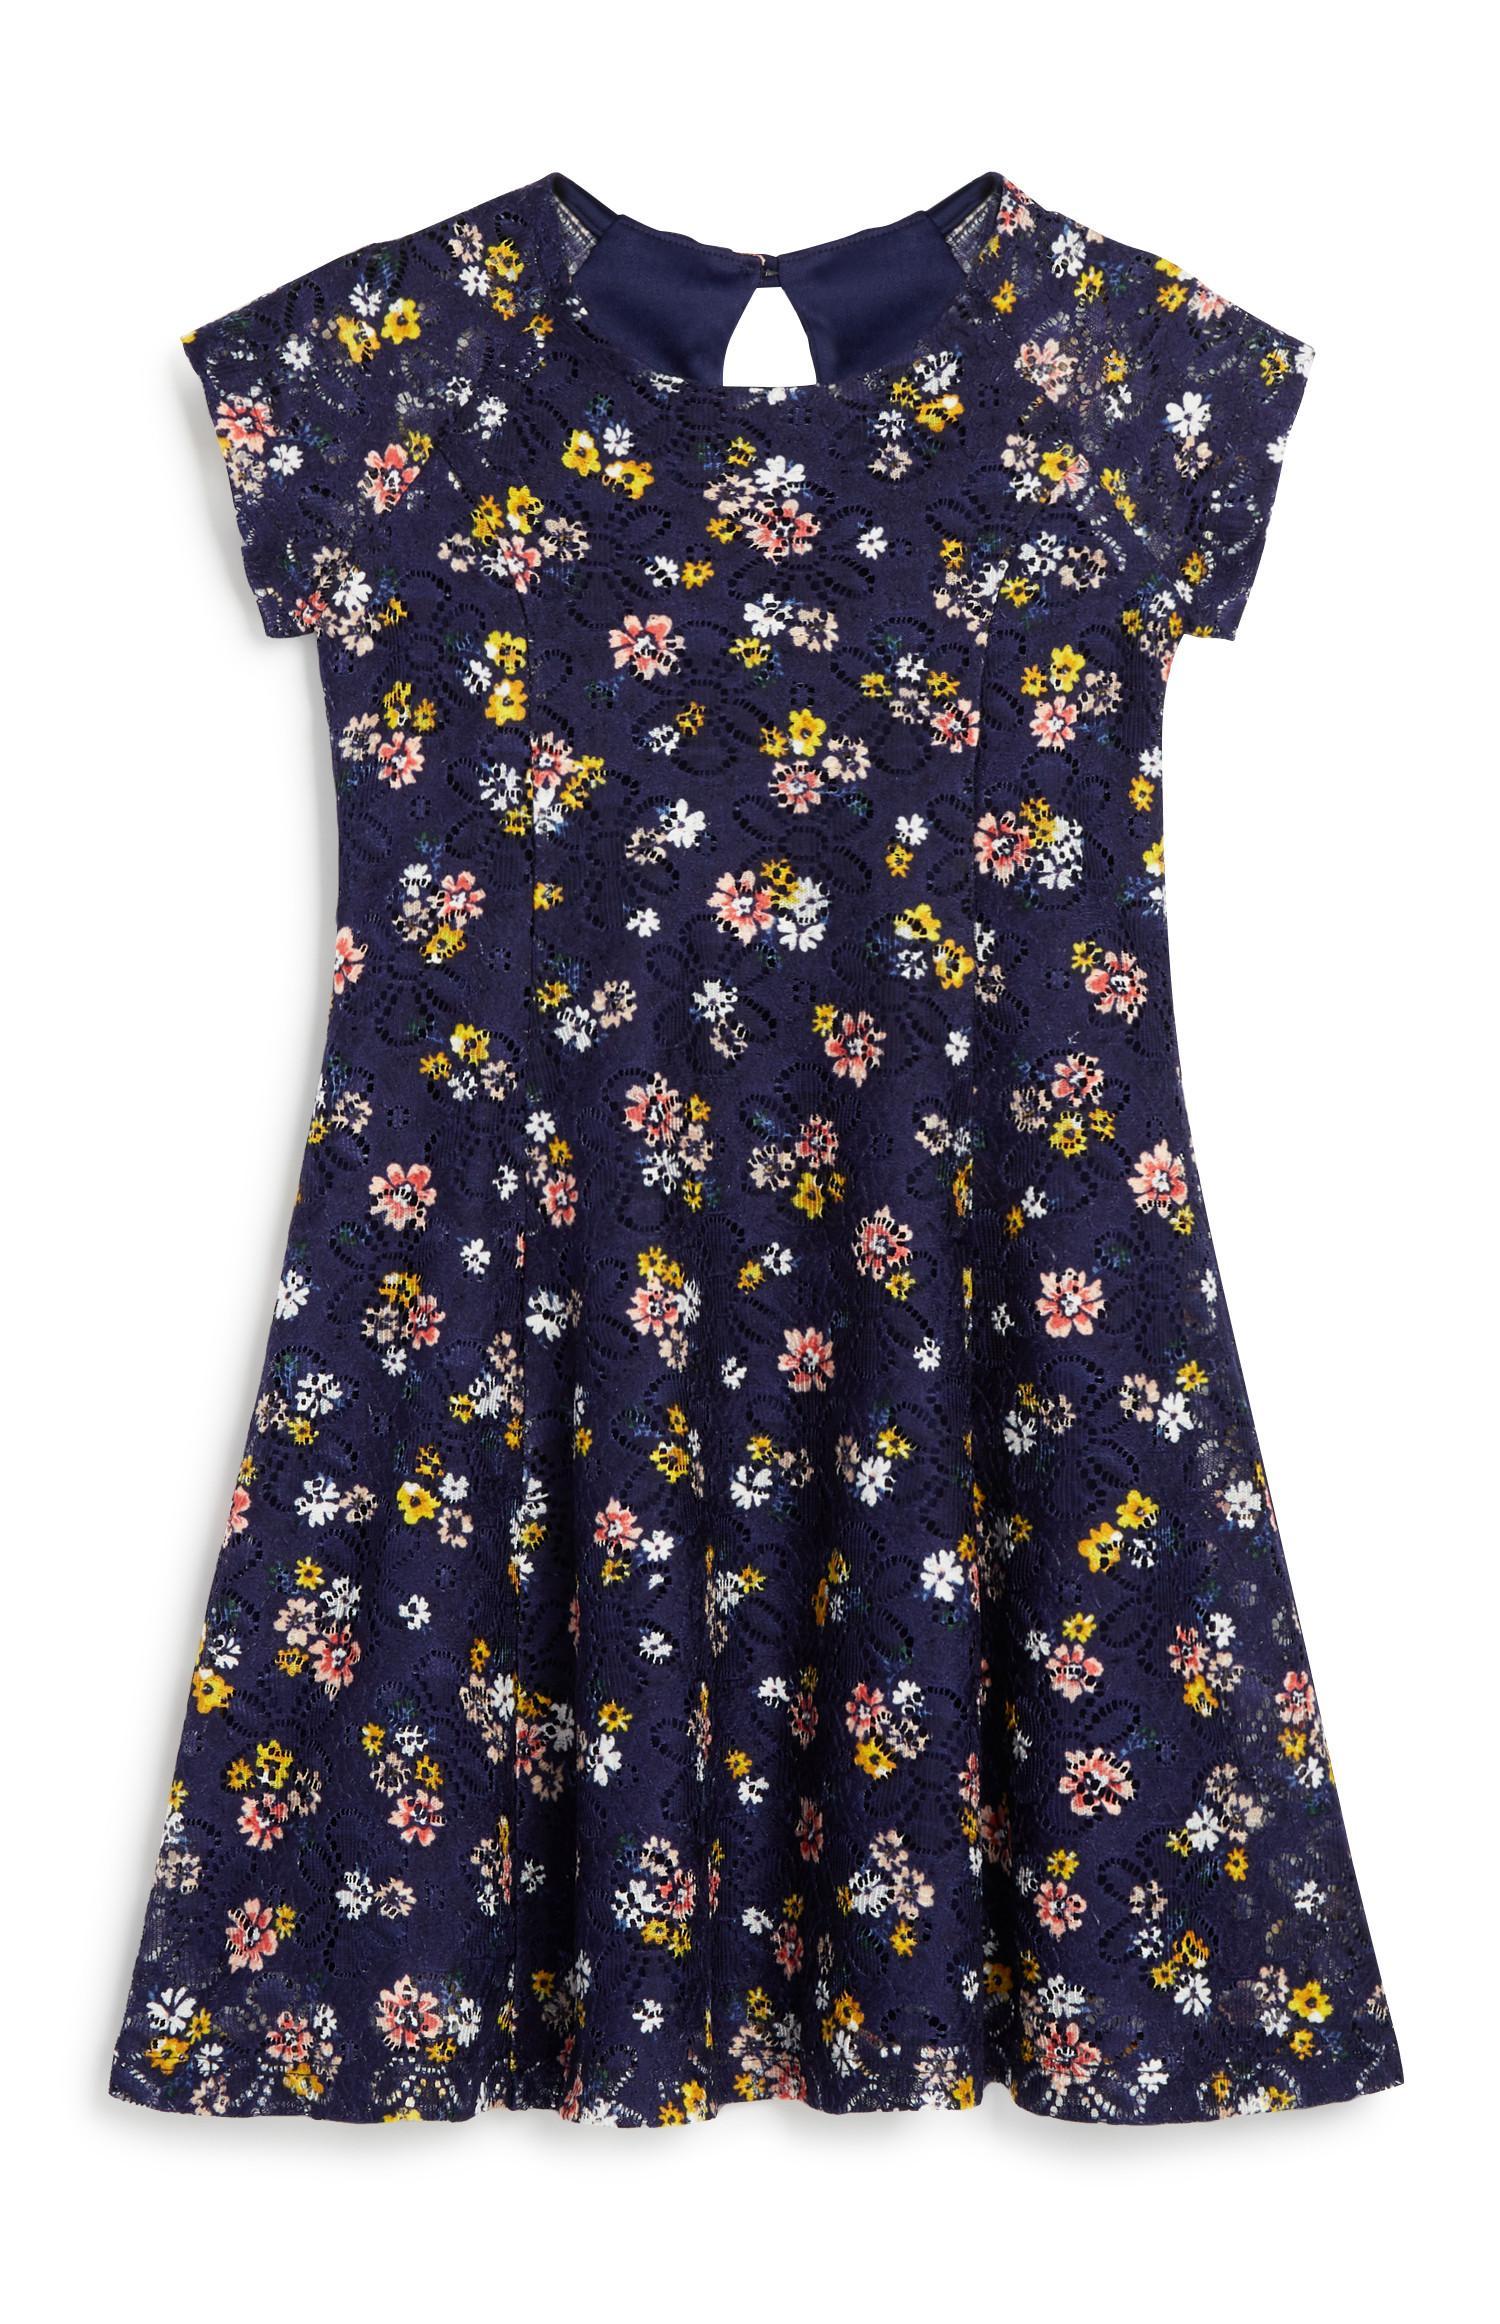 Vestido padrão floral menina